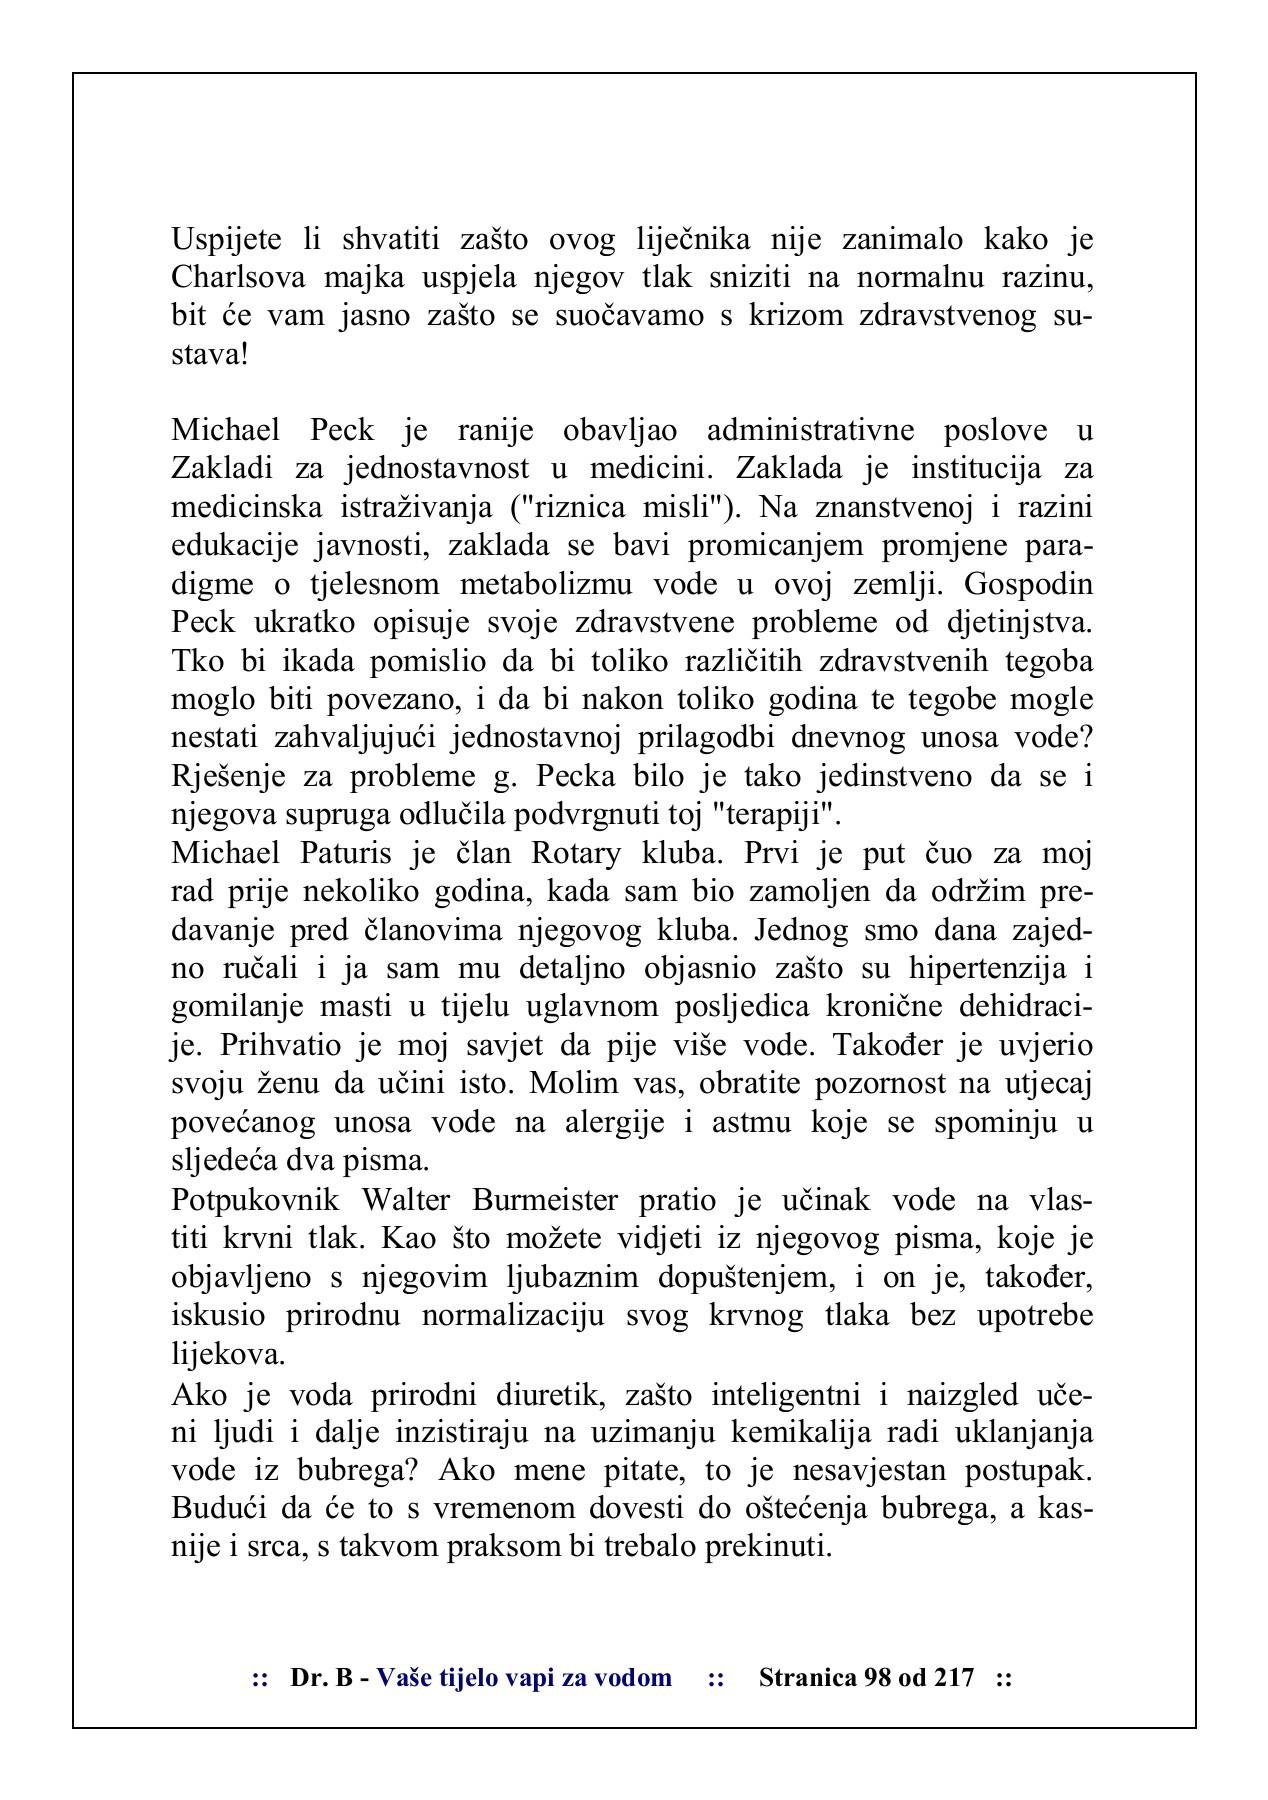 Visok krvni tlak (hipertenzija) - Stranica 10 - theturninggate.com